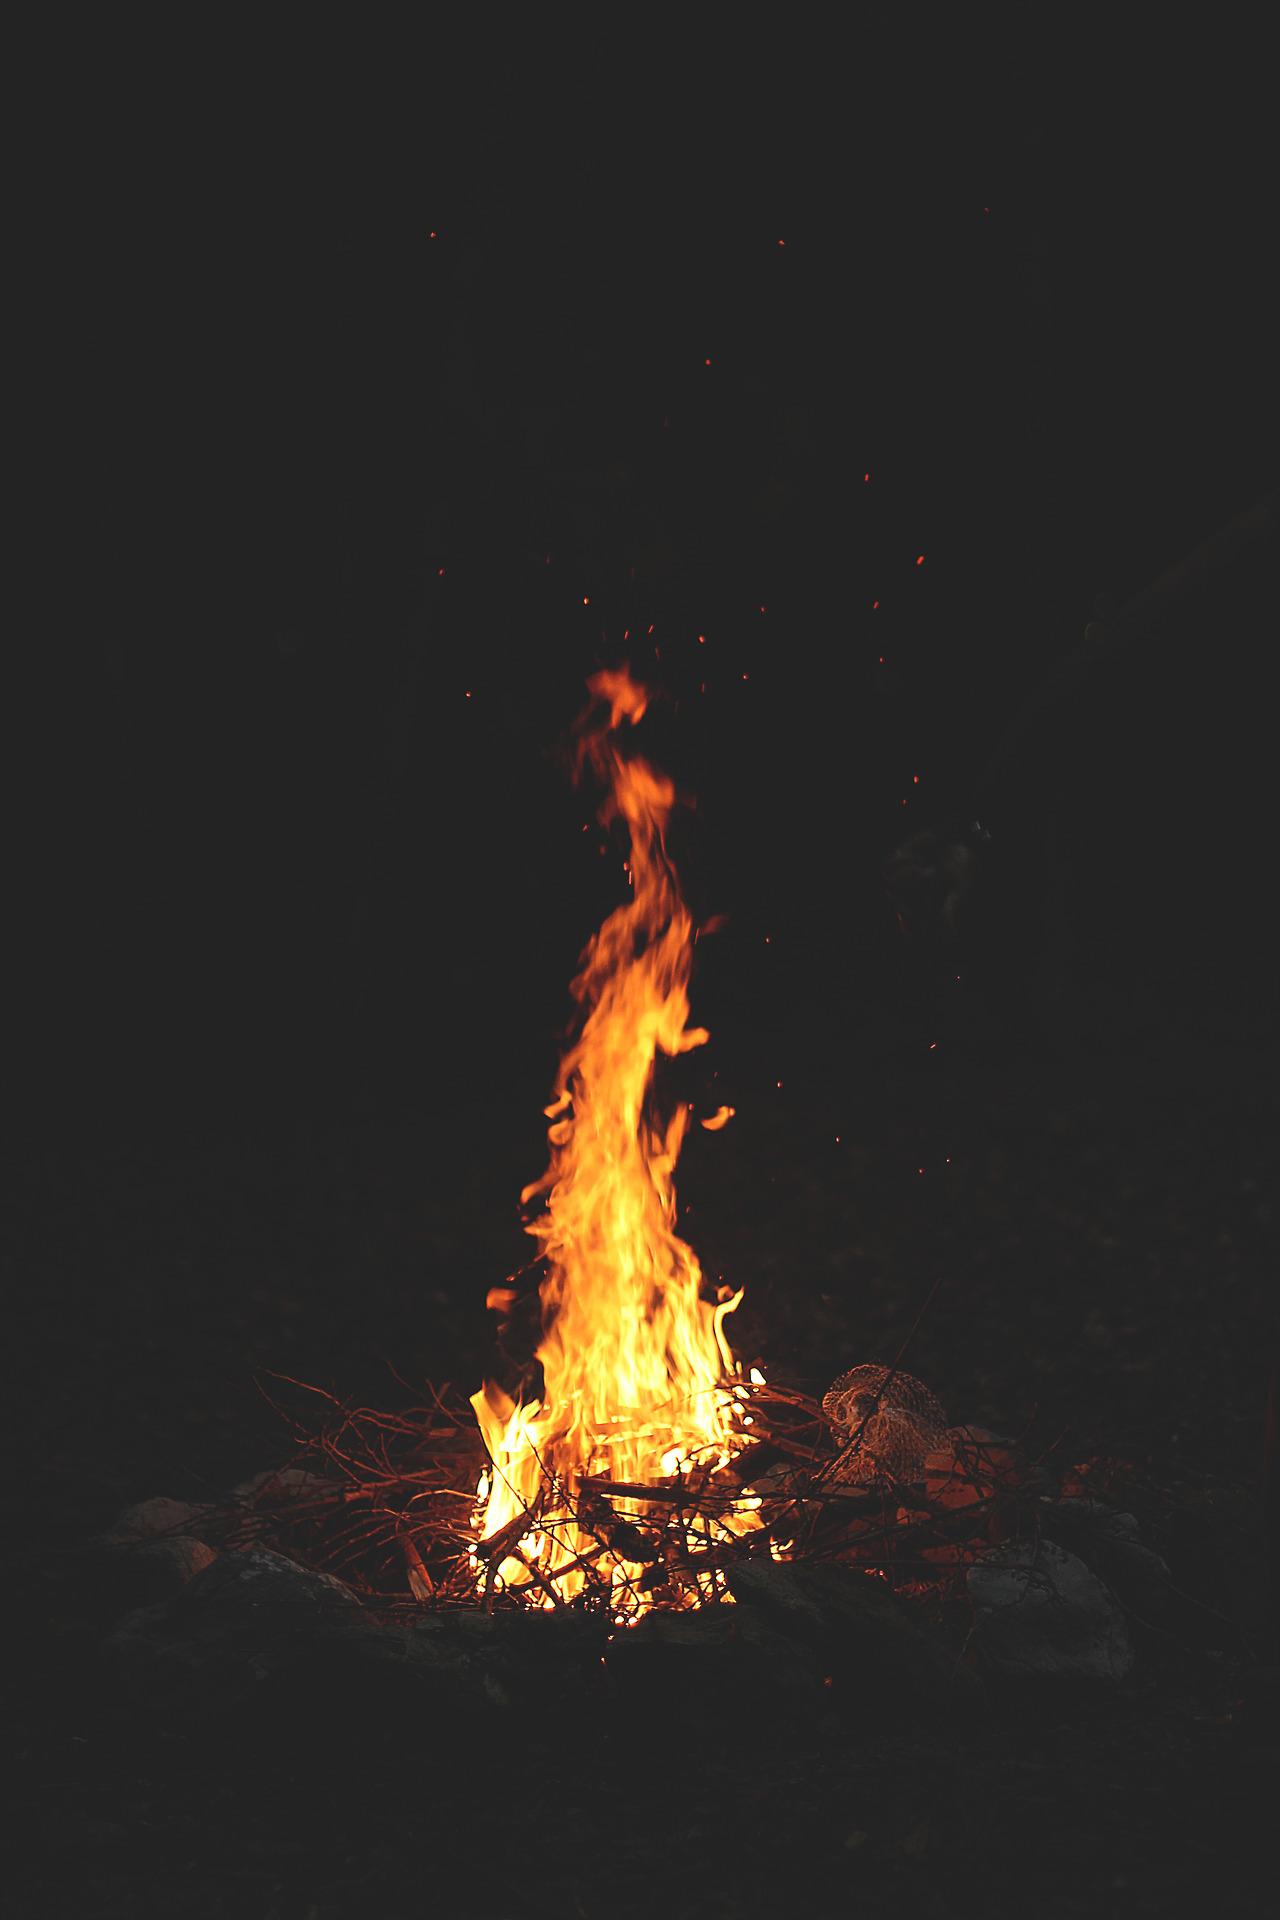 fire flame hot burn blaze bonfire smoke heat danger wildfire flammable energy